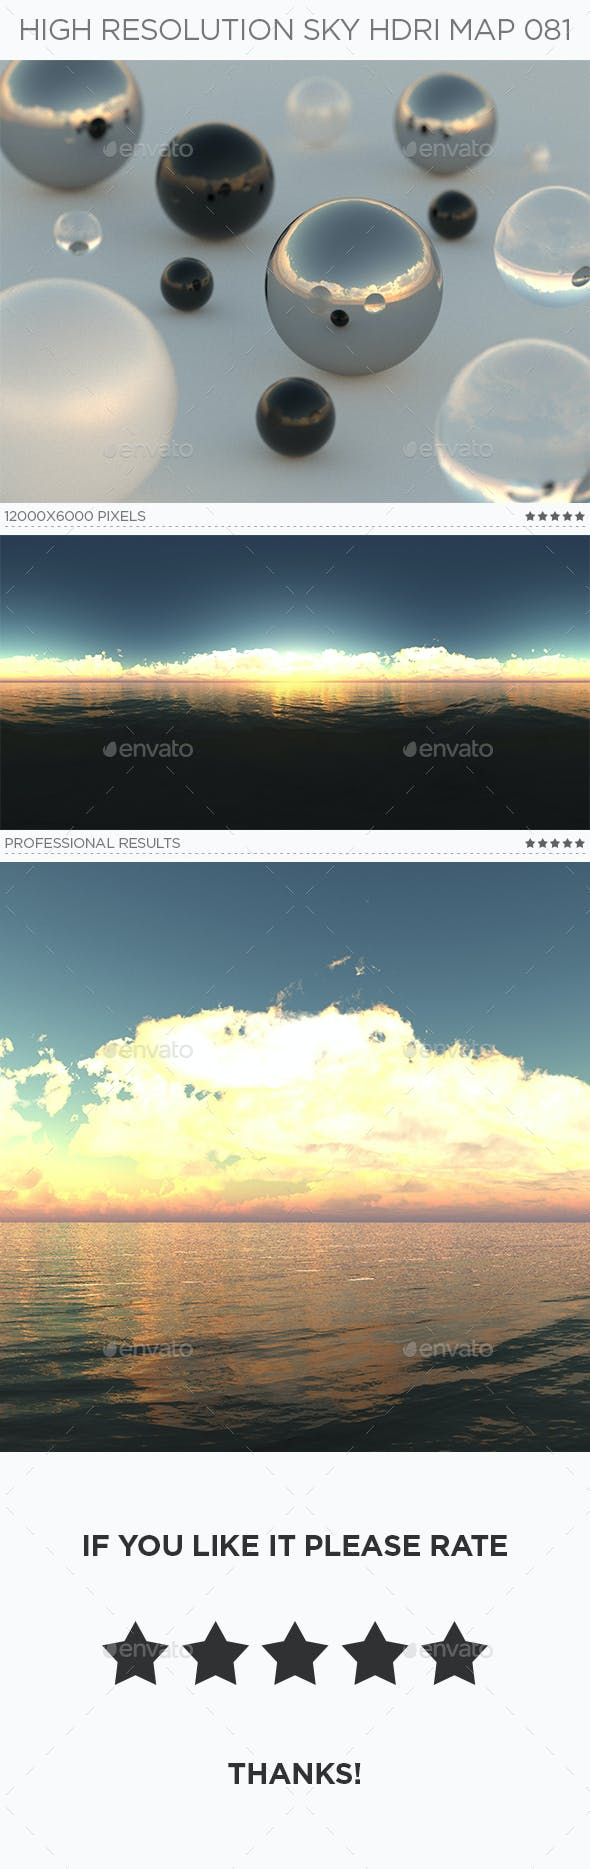 High Resolution Sky HDRi Map 081 - 3DOcean Item for Sale